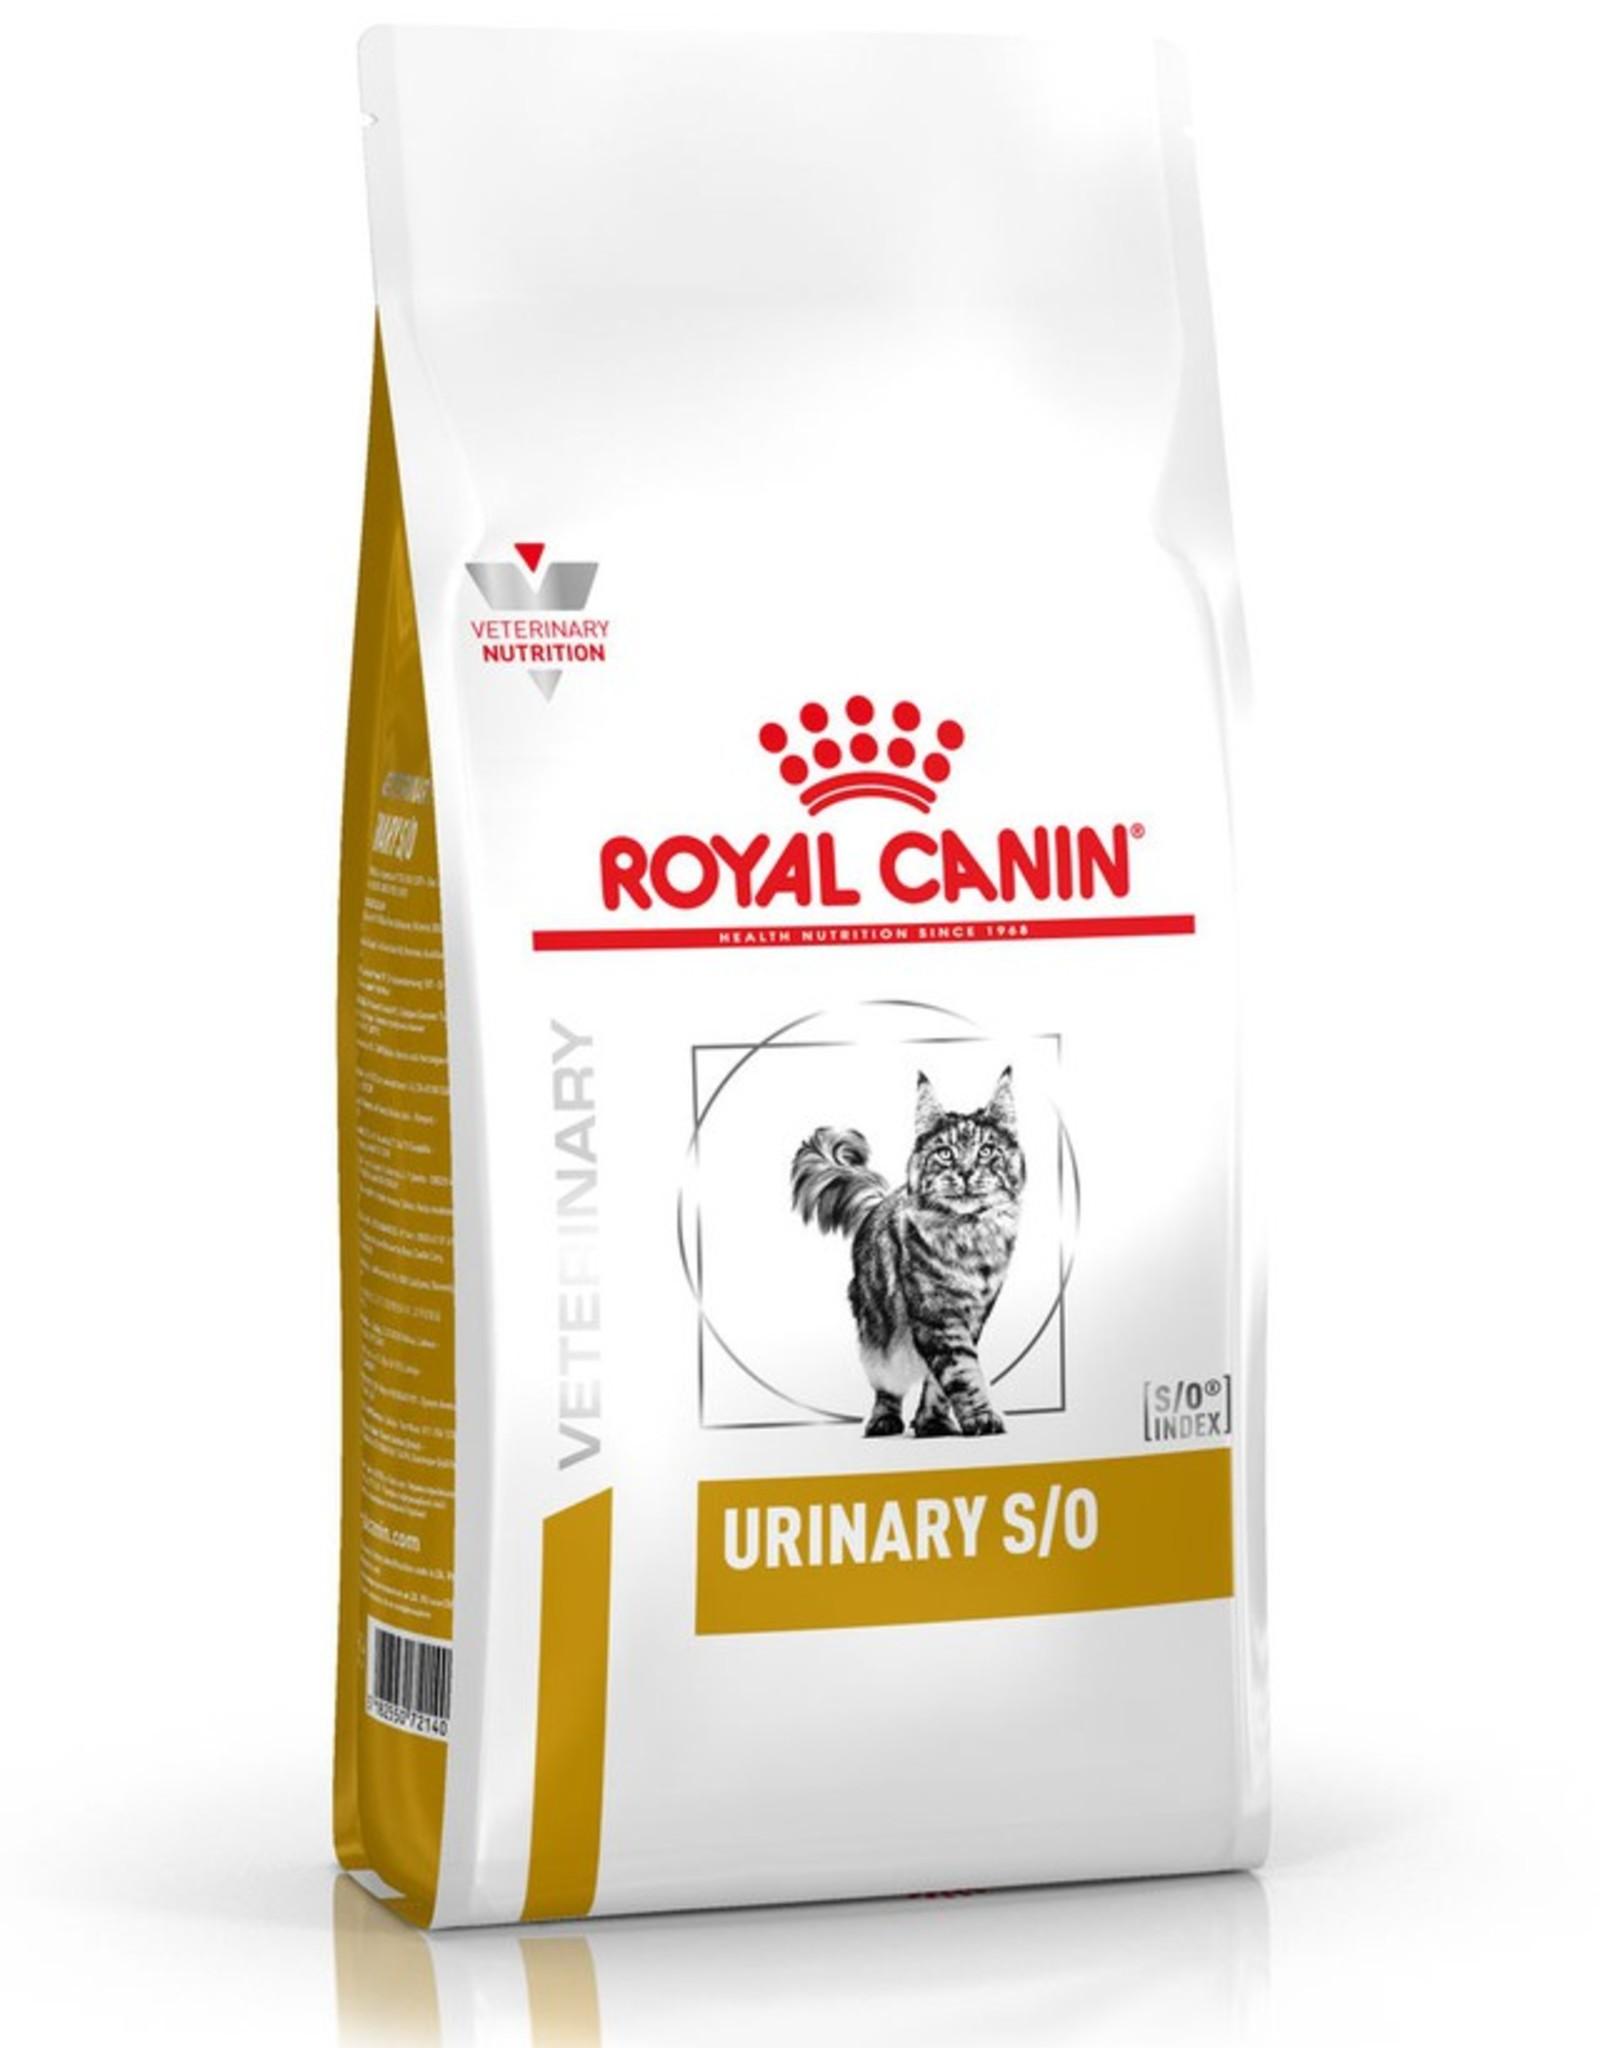 Royal Canin Royal Canin Urinary S/o Kat 3,5kg